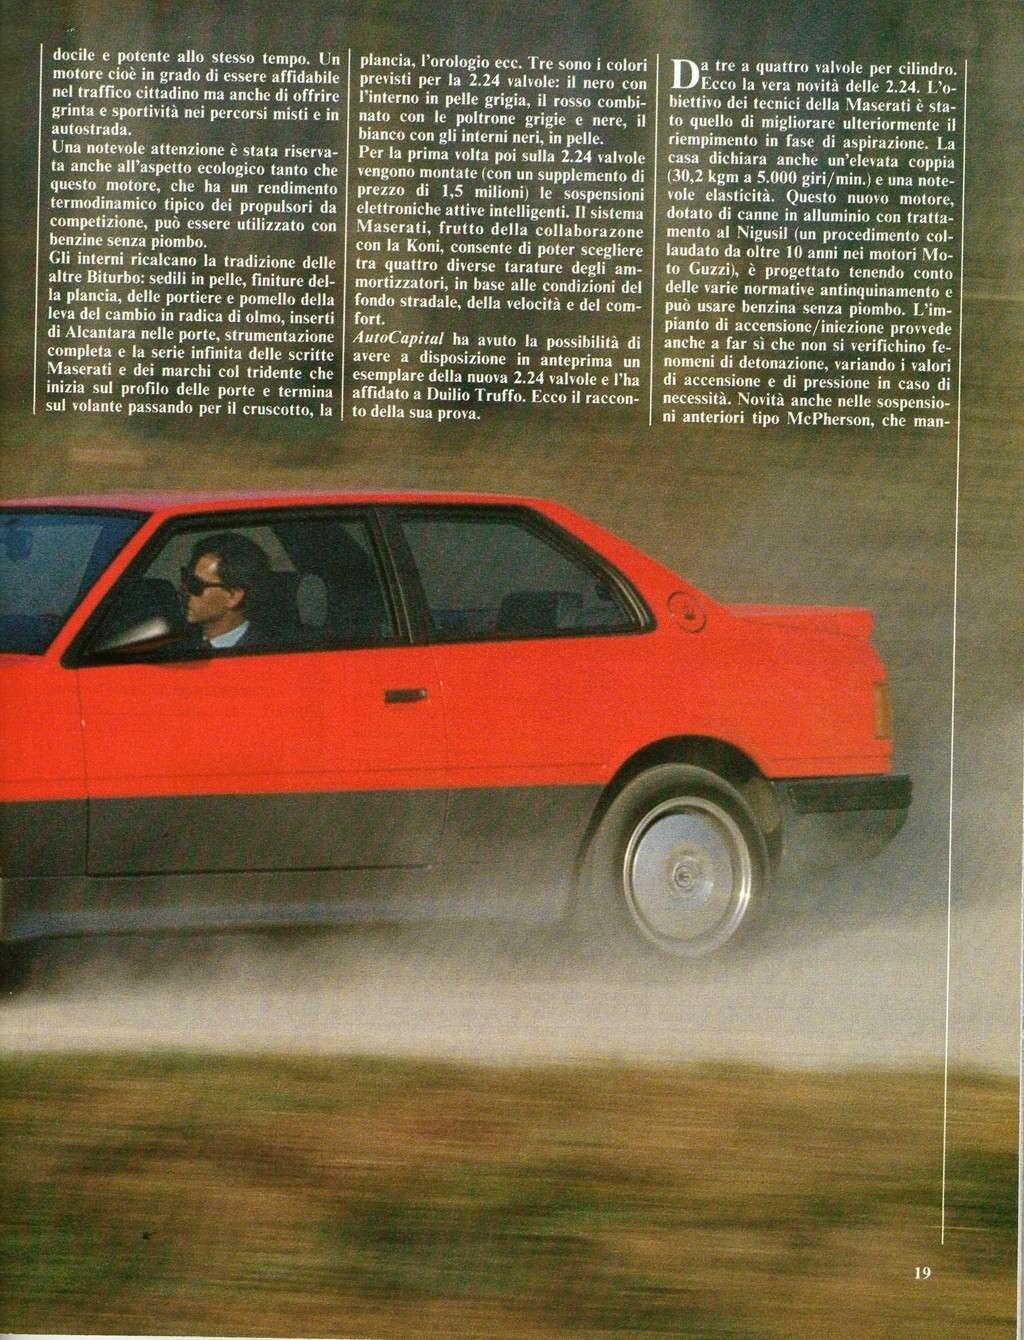 long term test Maserati 2.24v.....autocapital novembre 1989 Immagi27